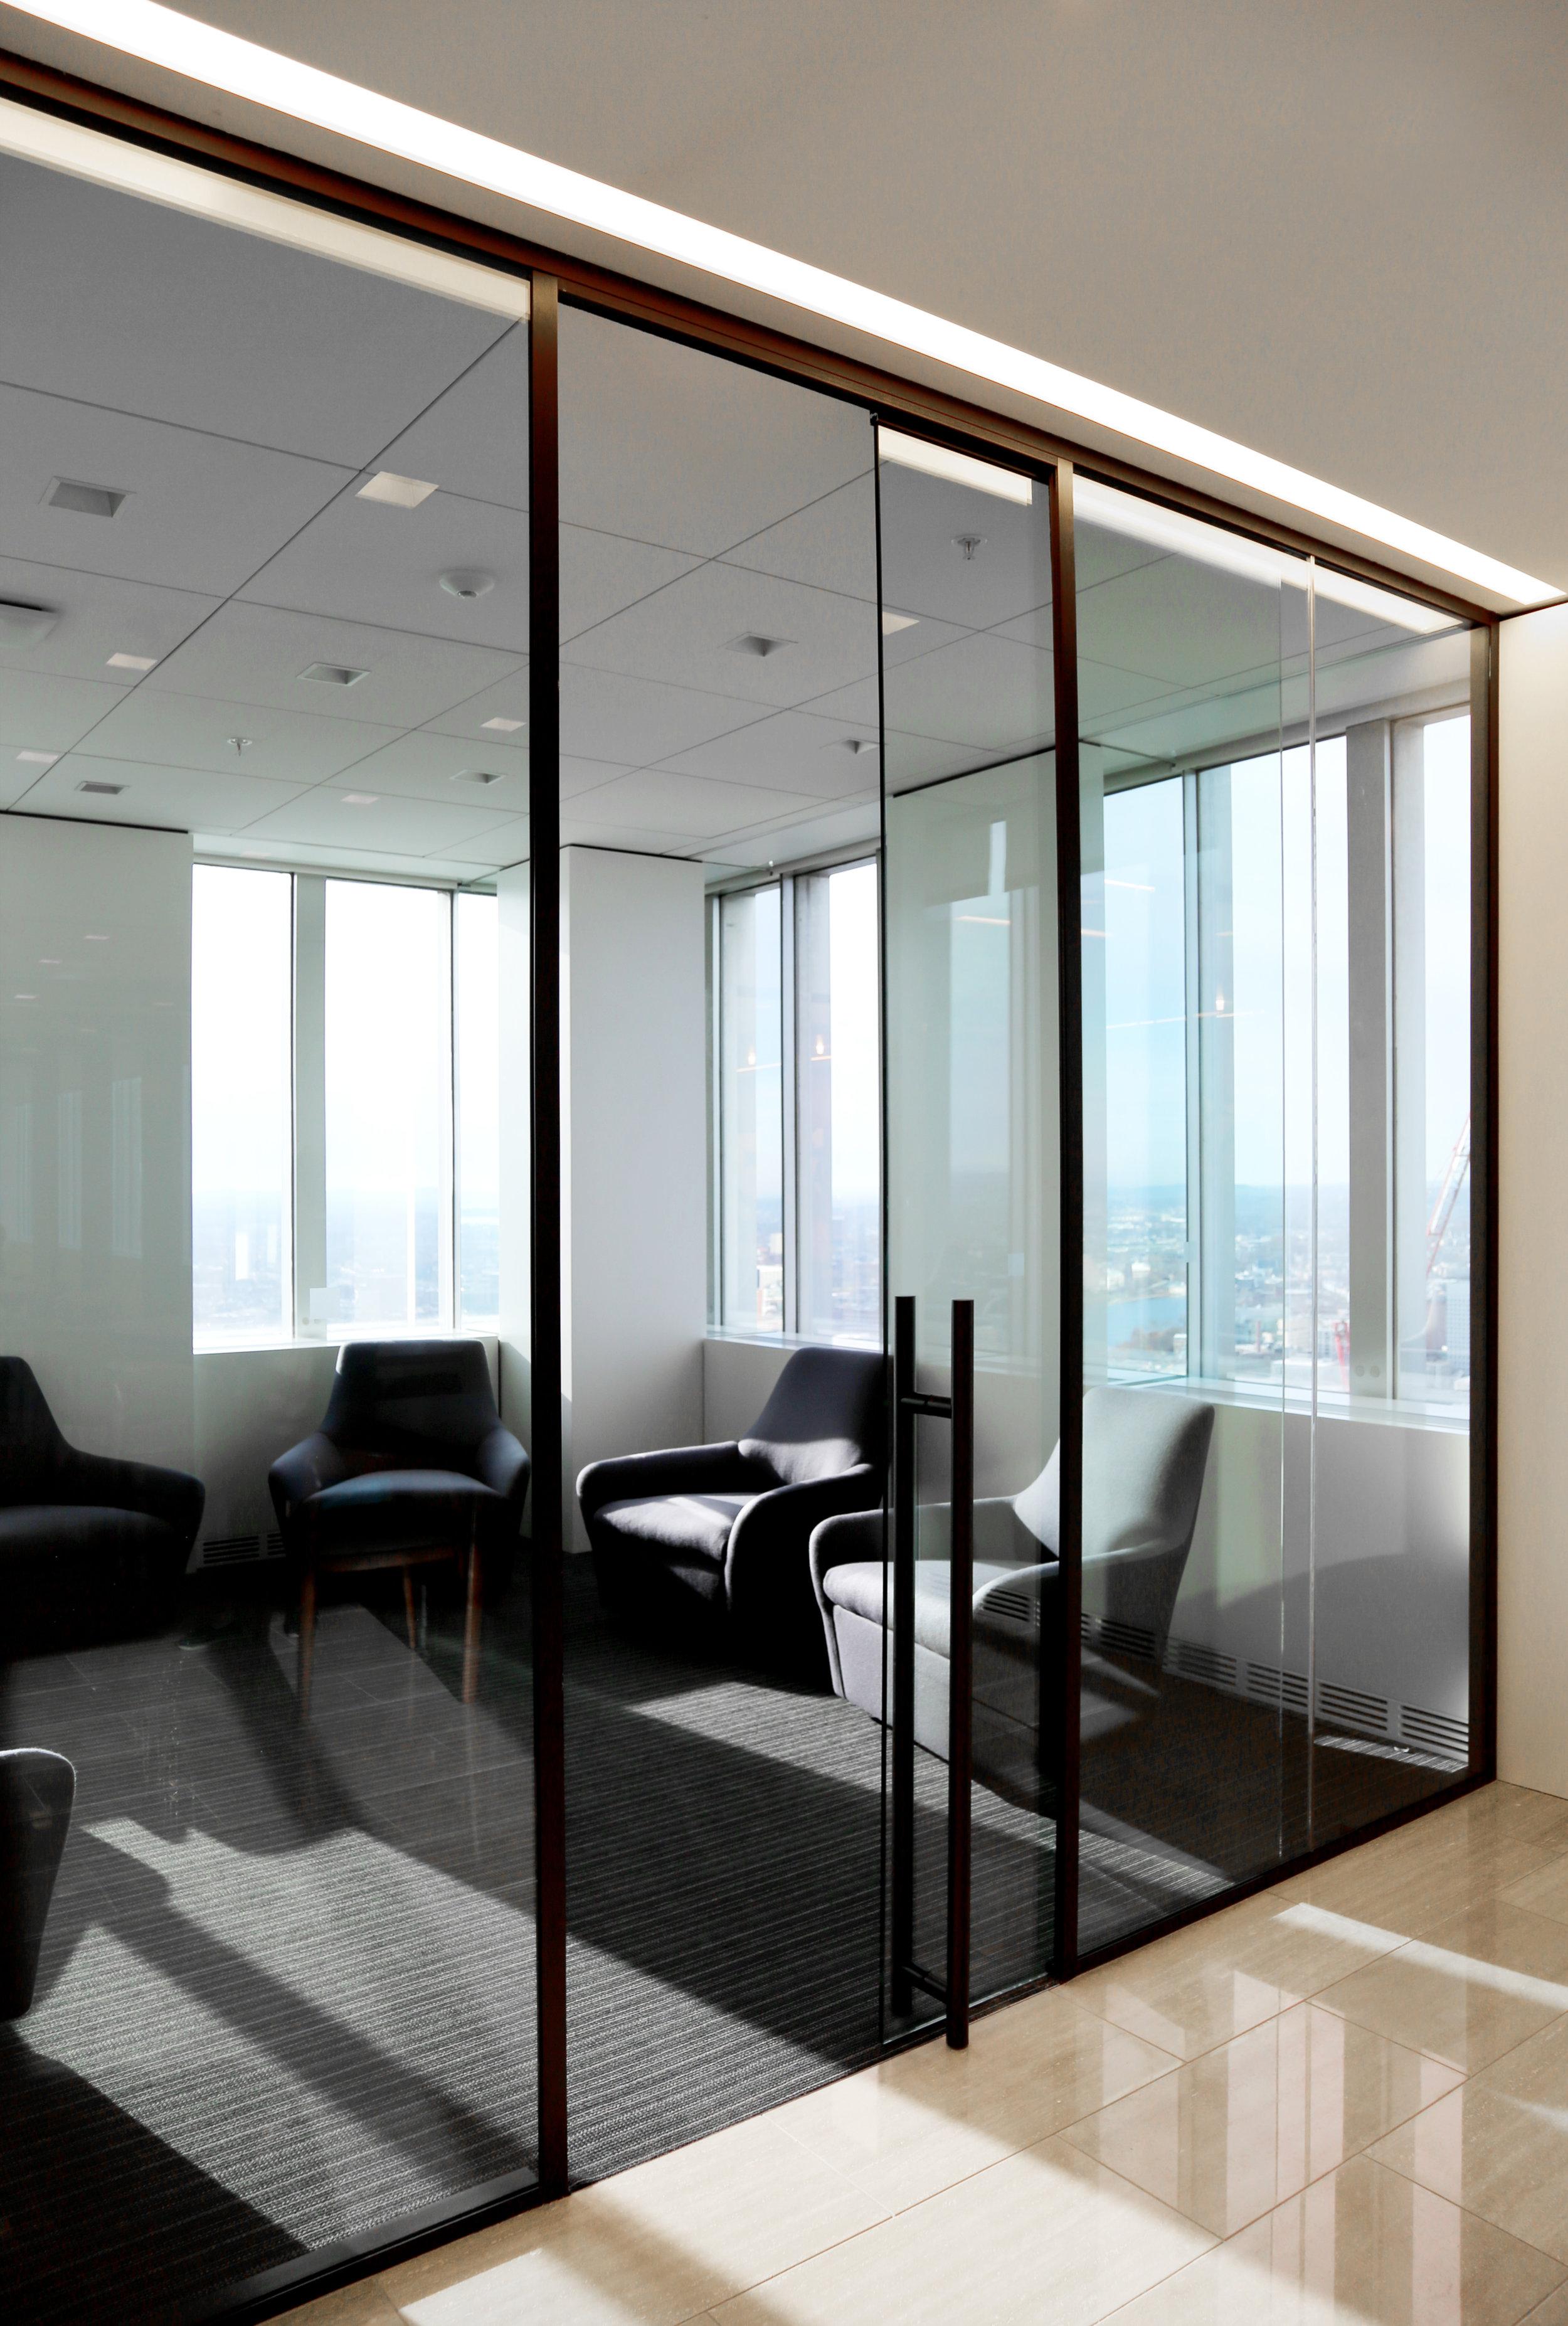 Modernus Demountable Glass Huddle Room Sliding Door - Spaceworks AI.jpg